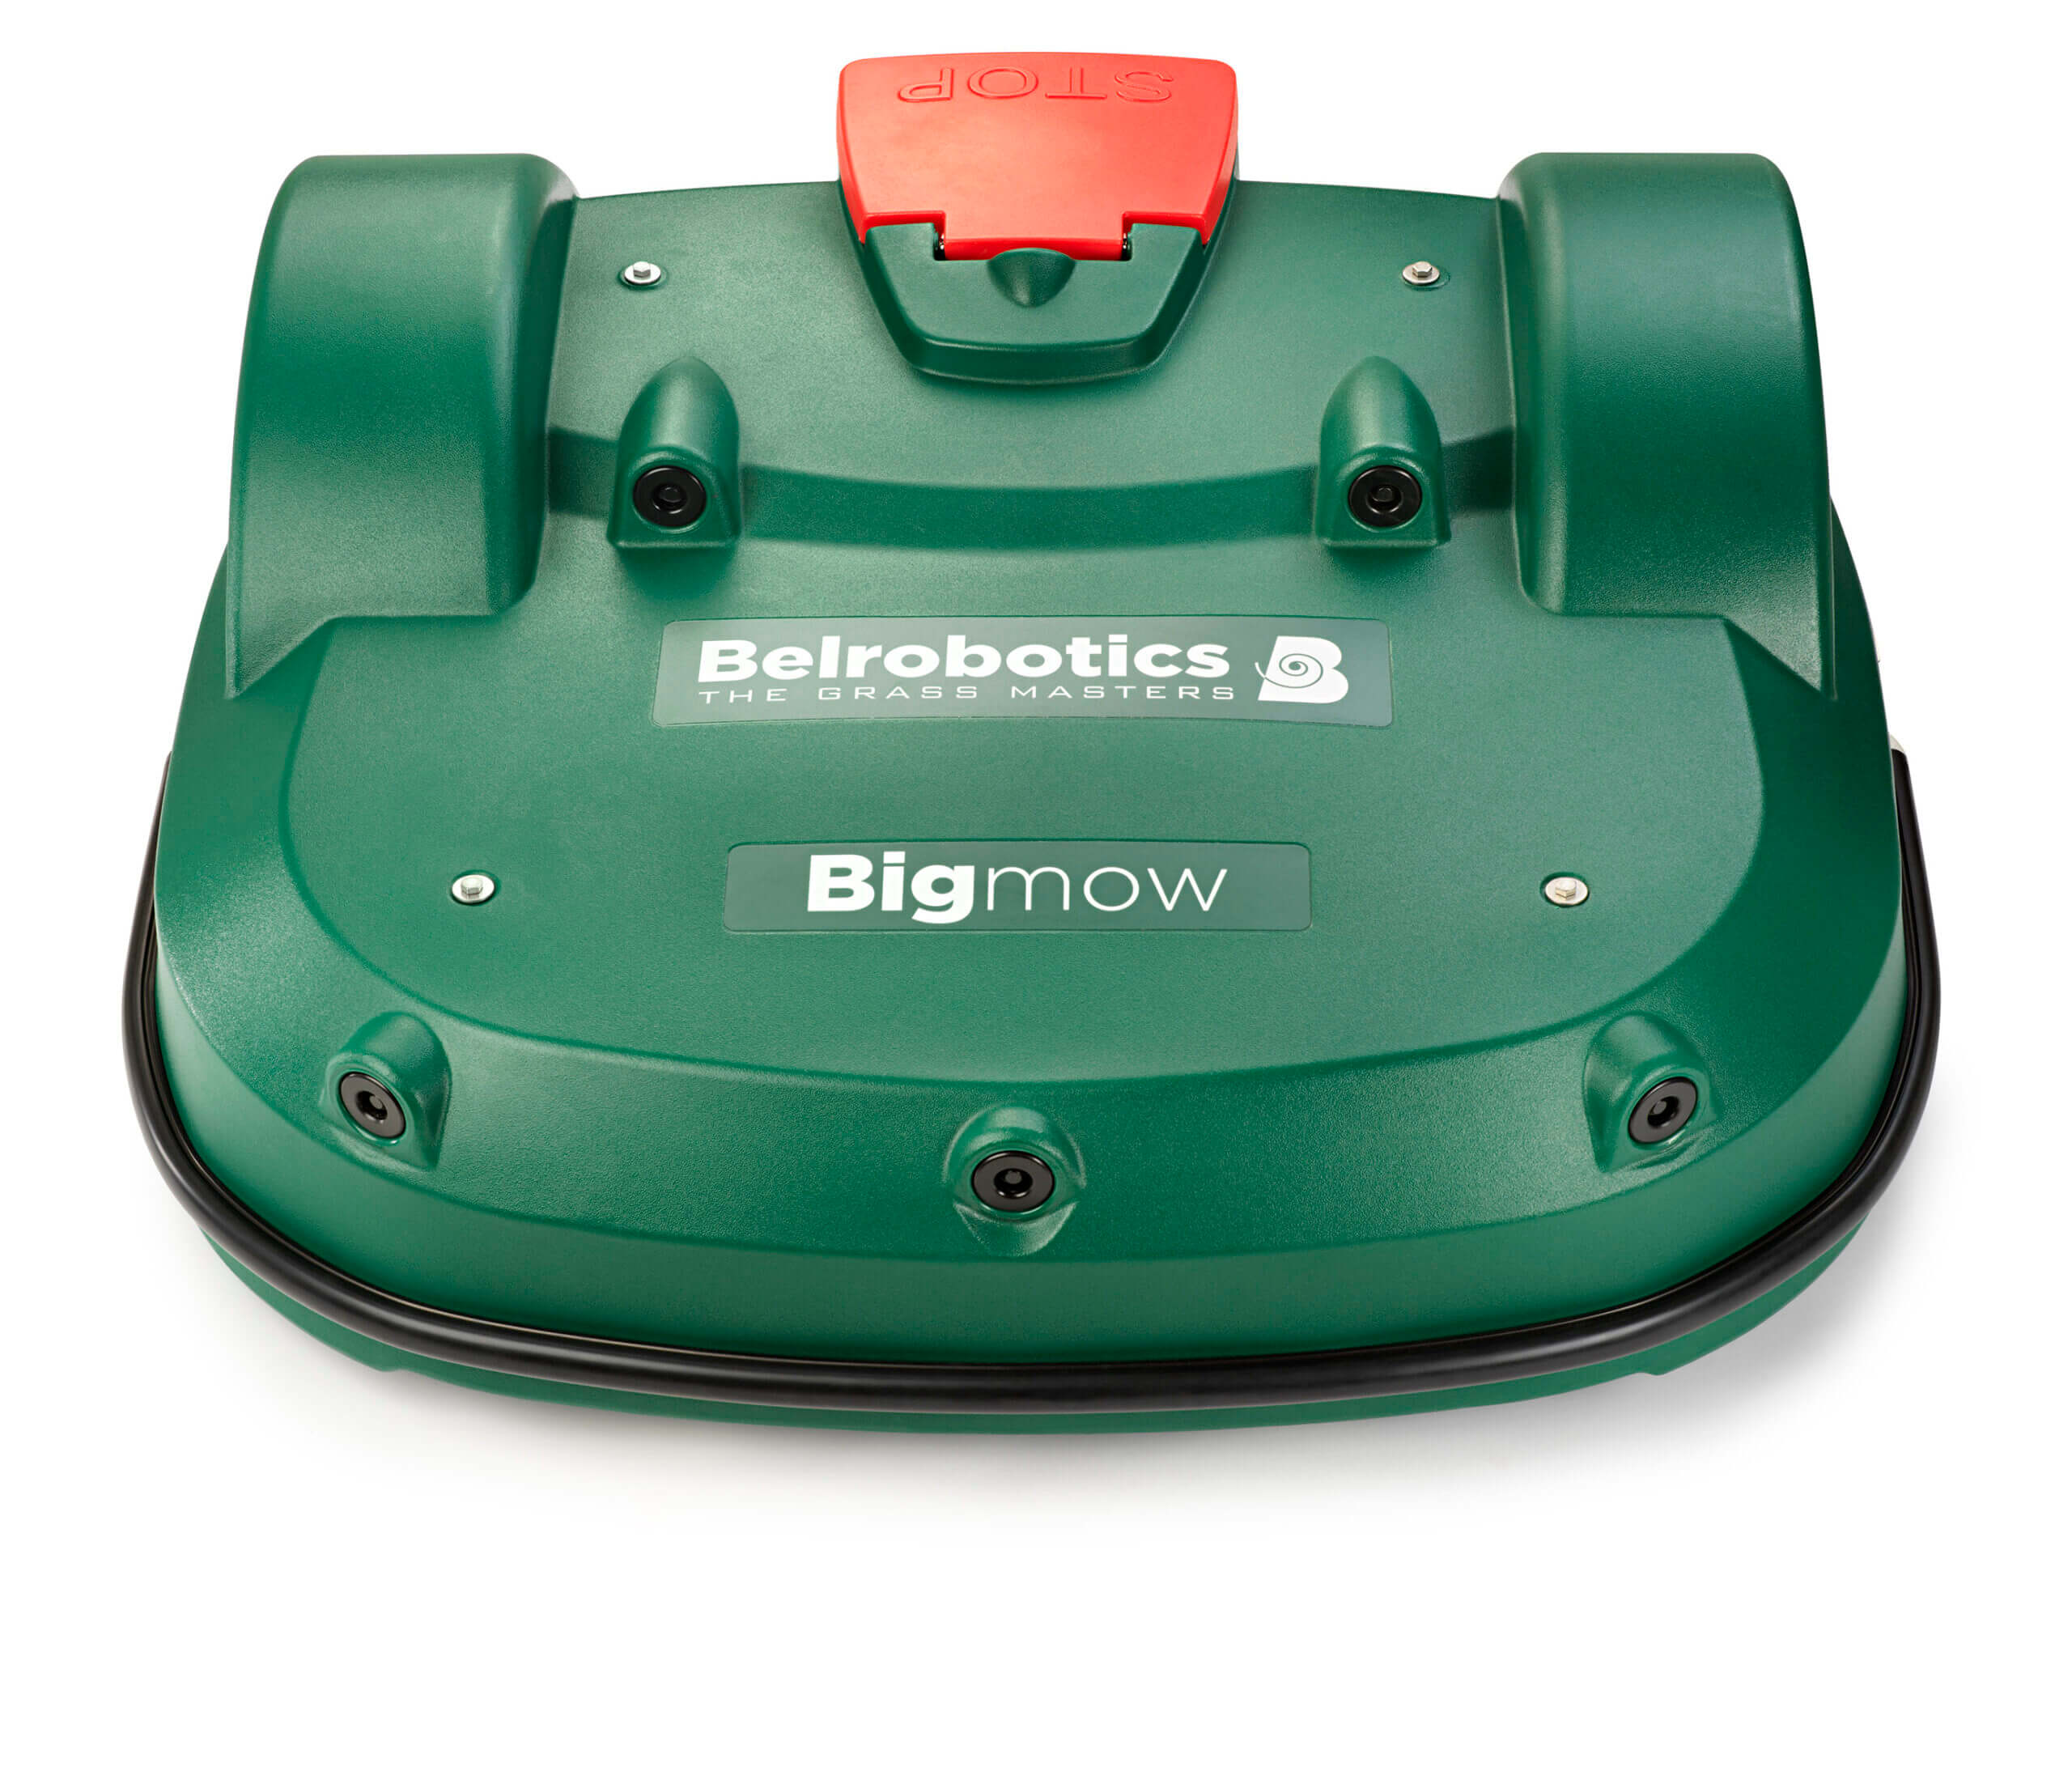 Belrobotics BIGMOW Connected Robotic Mower